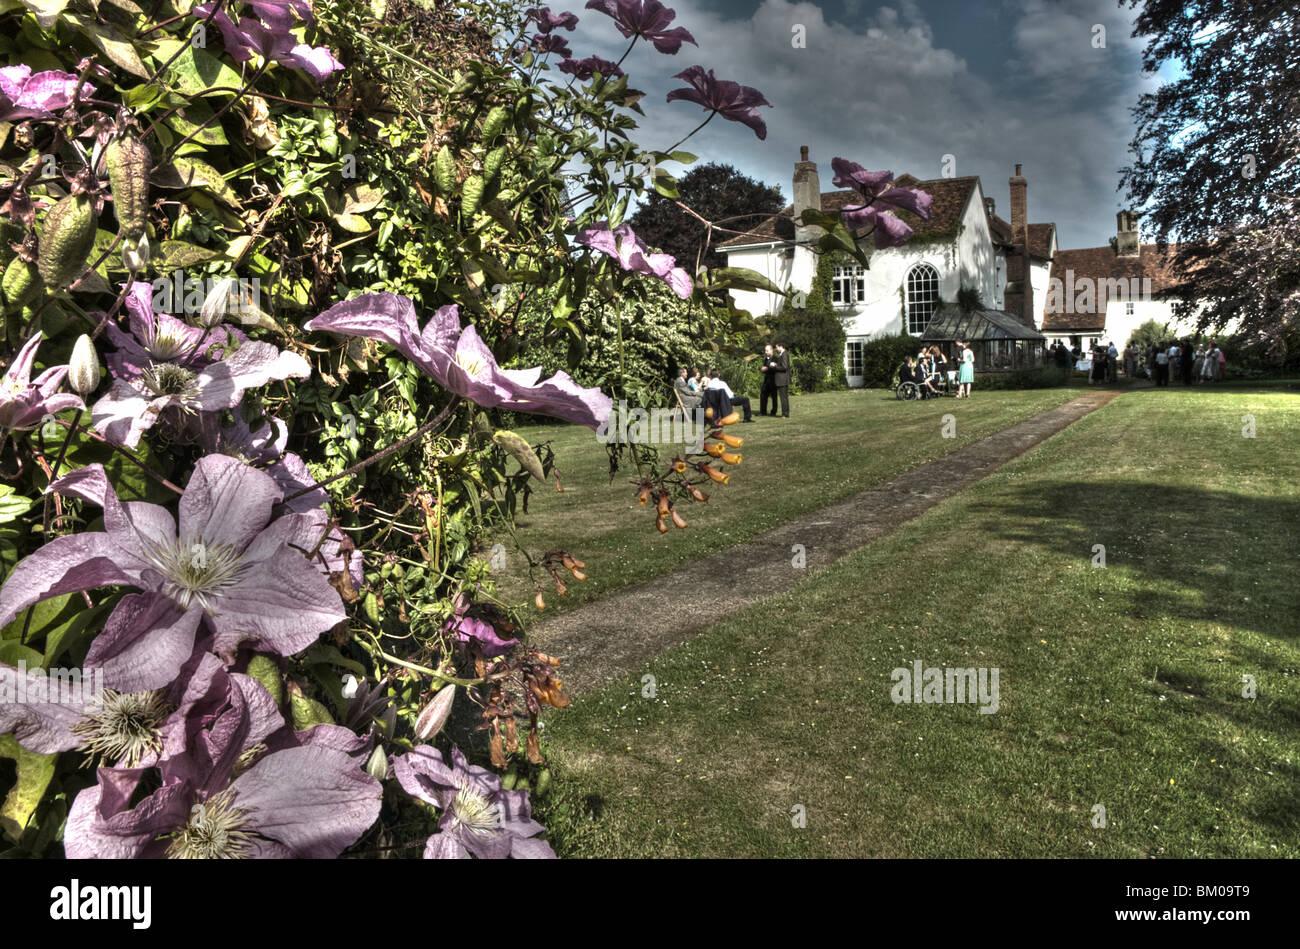 Summer garden wedding reception with clematis flowering in Suffolk England - Stock Image